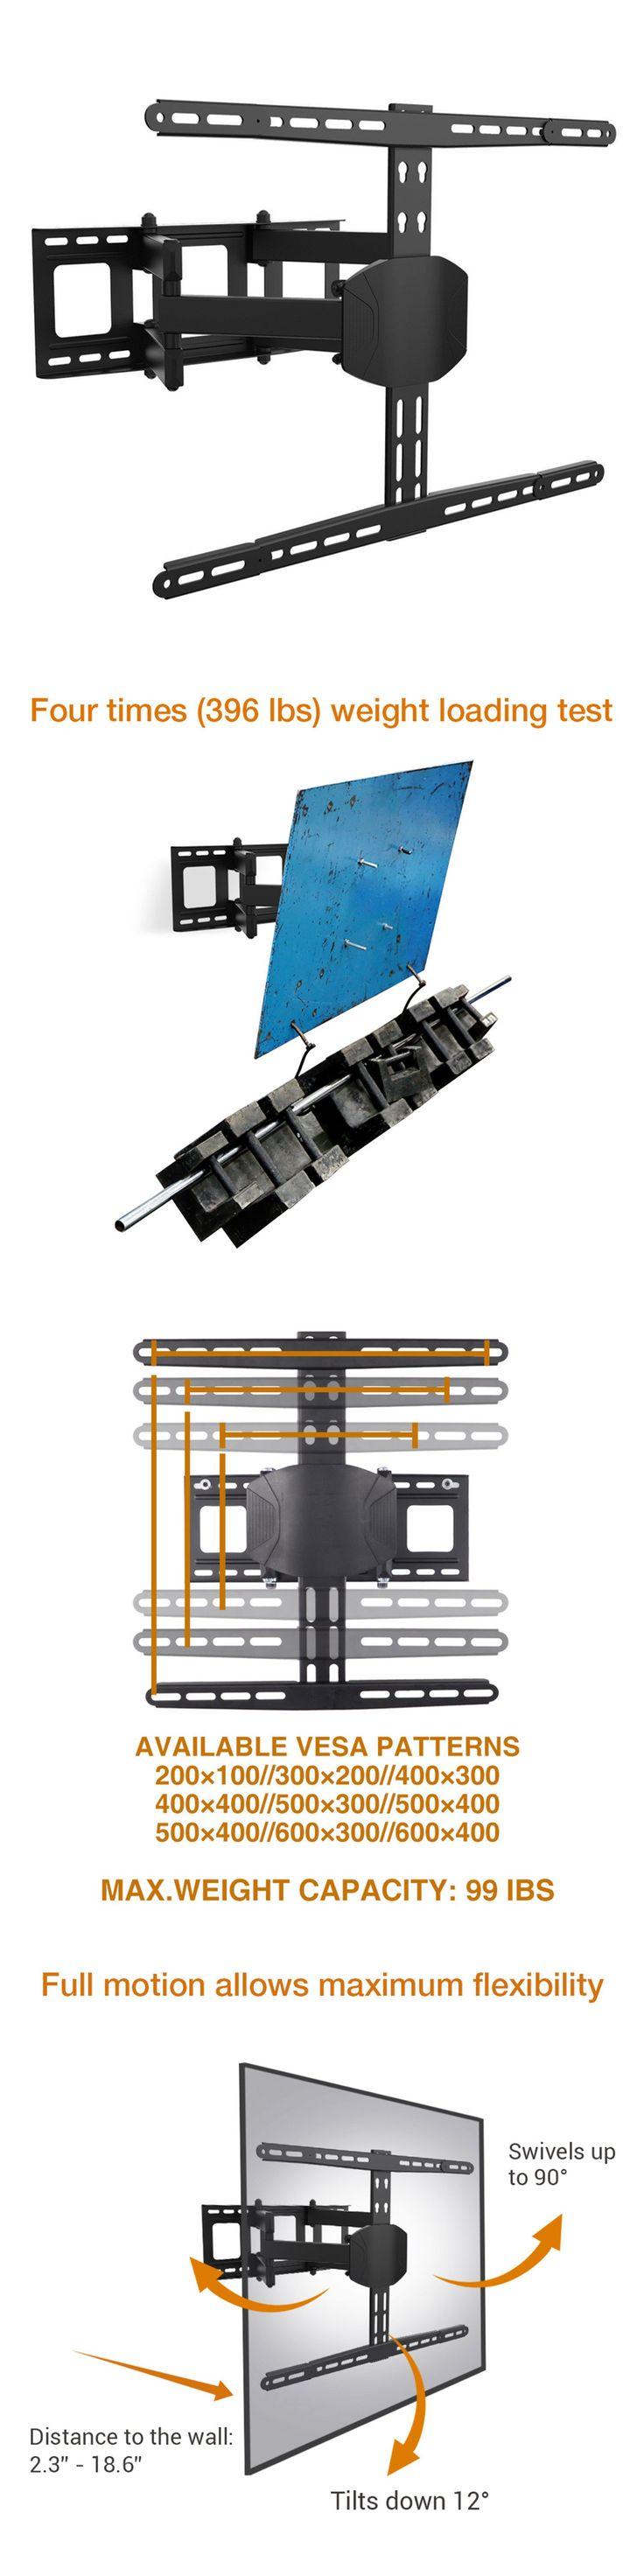 TV Mounts and Brackets: Loctek L8 Full Motion Articulating Swivel Lcd Led Plasma Tv Wall Mount Bracket -> BUY IT NOW ONLY: $54.99 on eBay!